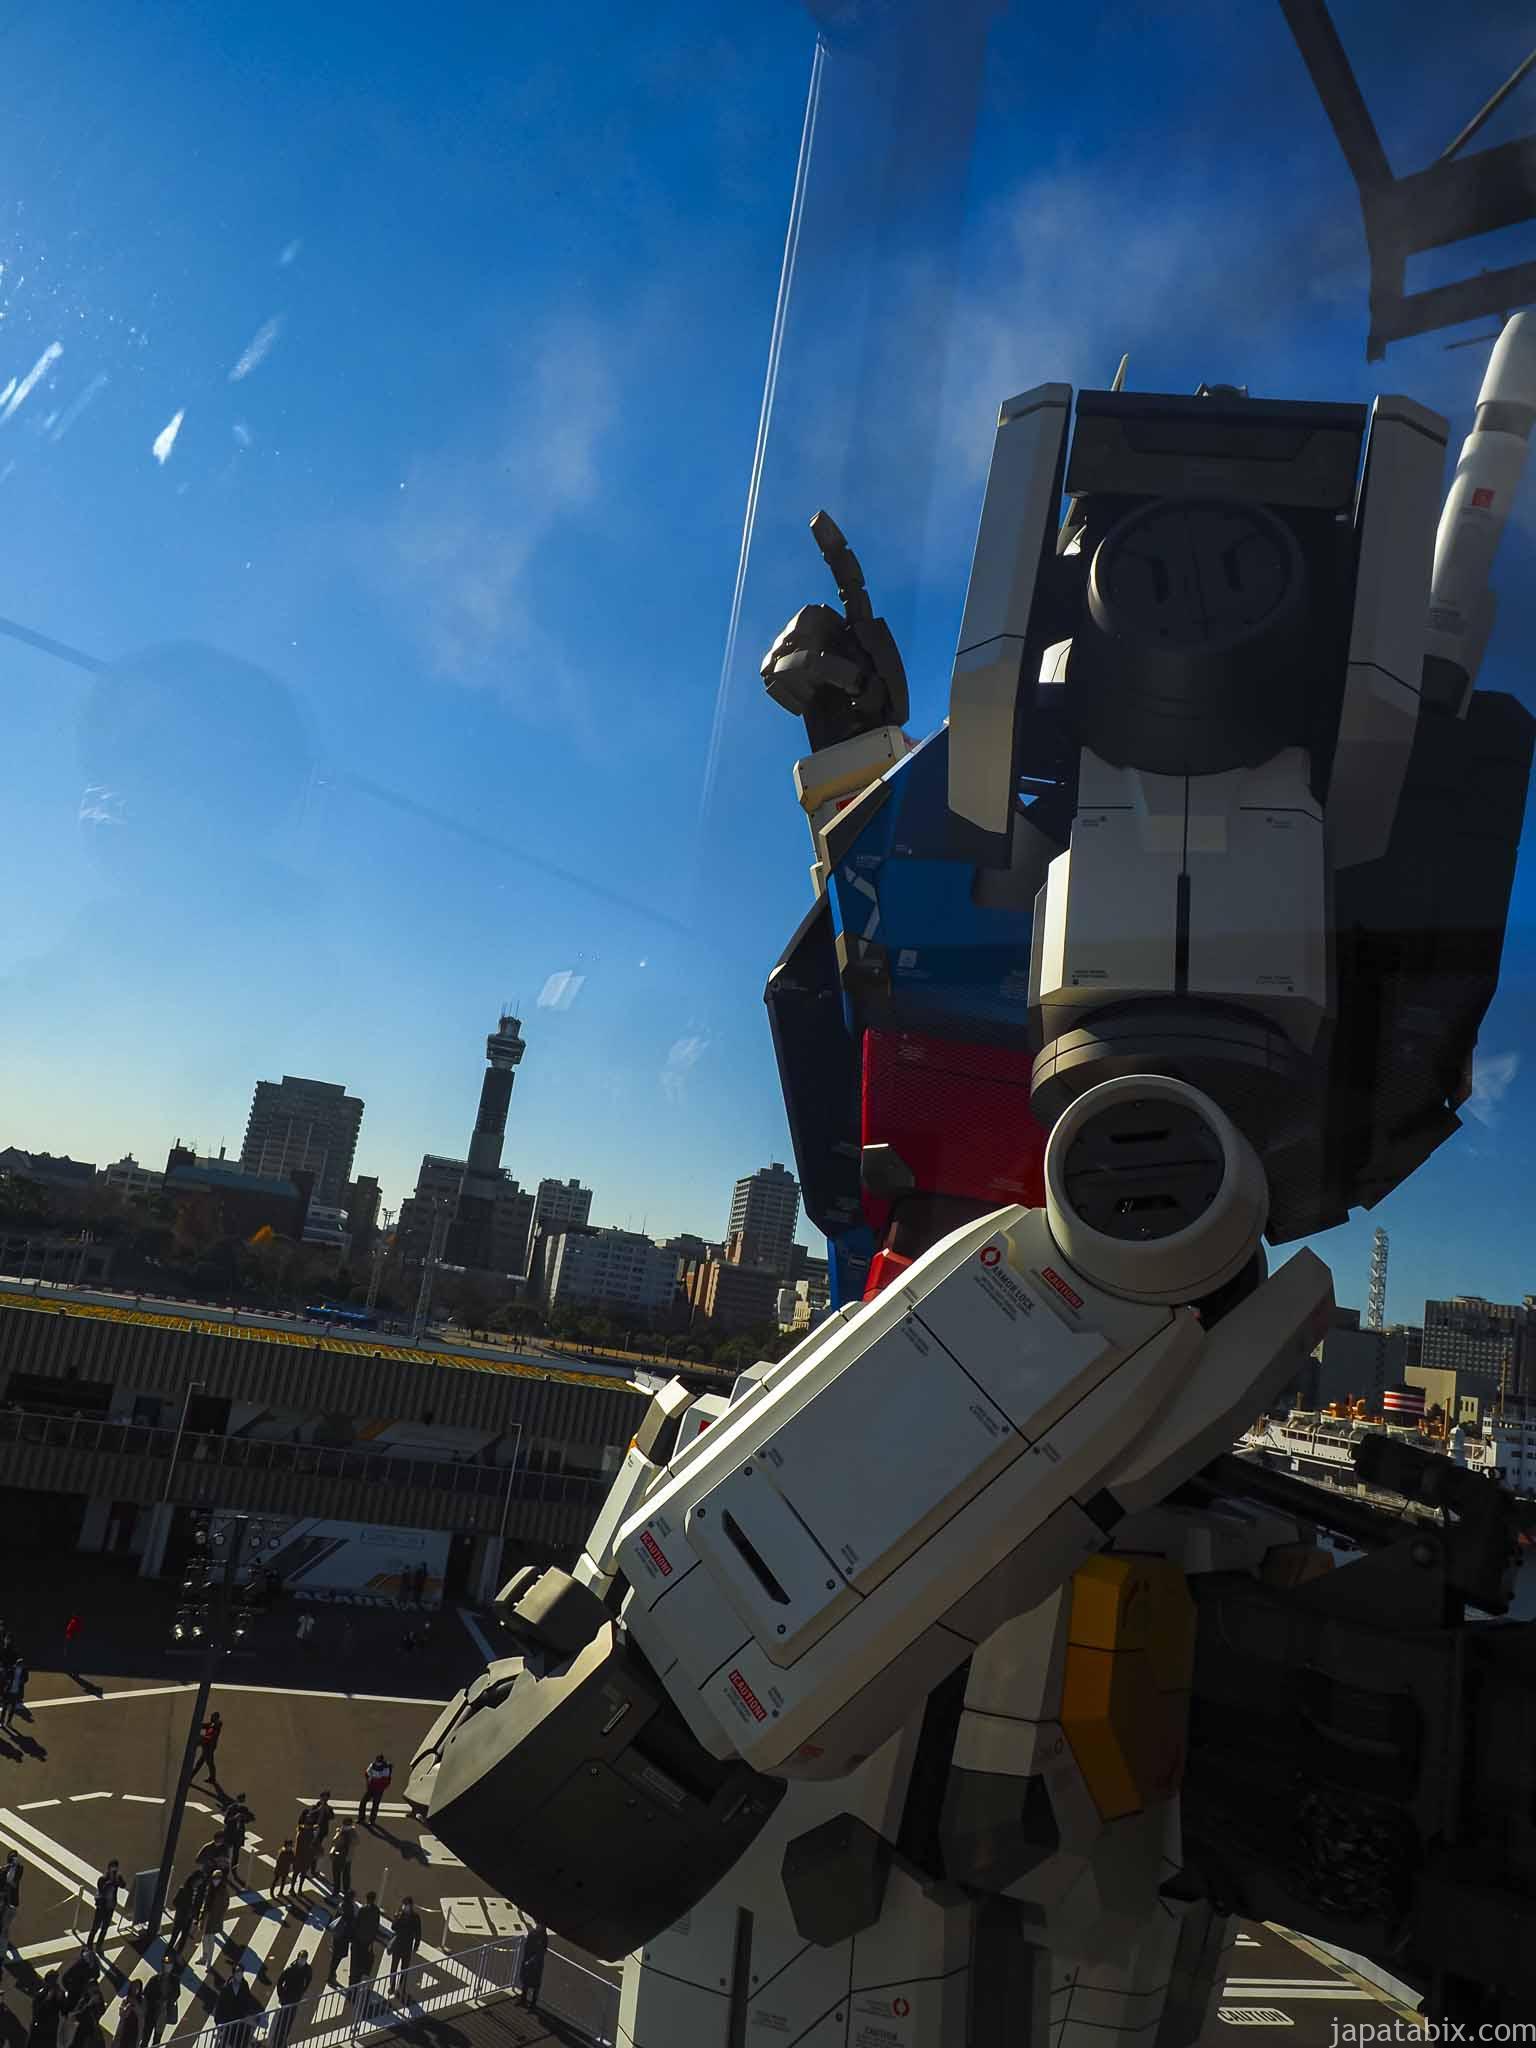 RX-78F00 ガンダムをGUNDAM-DOCK TOWERから見る